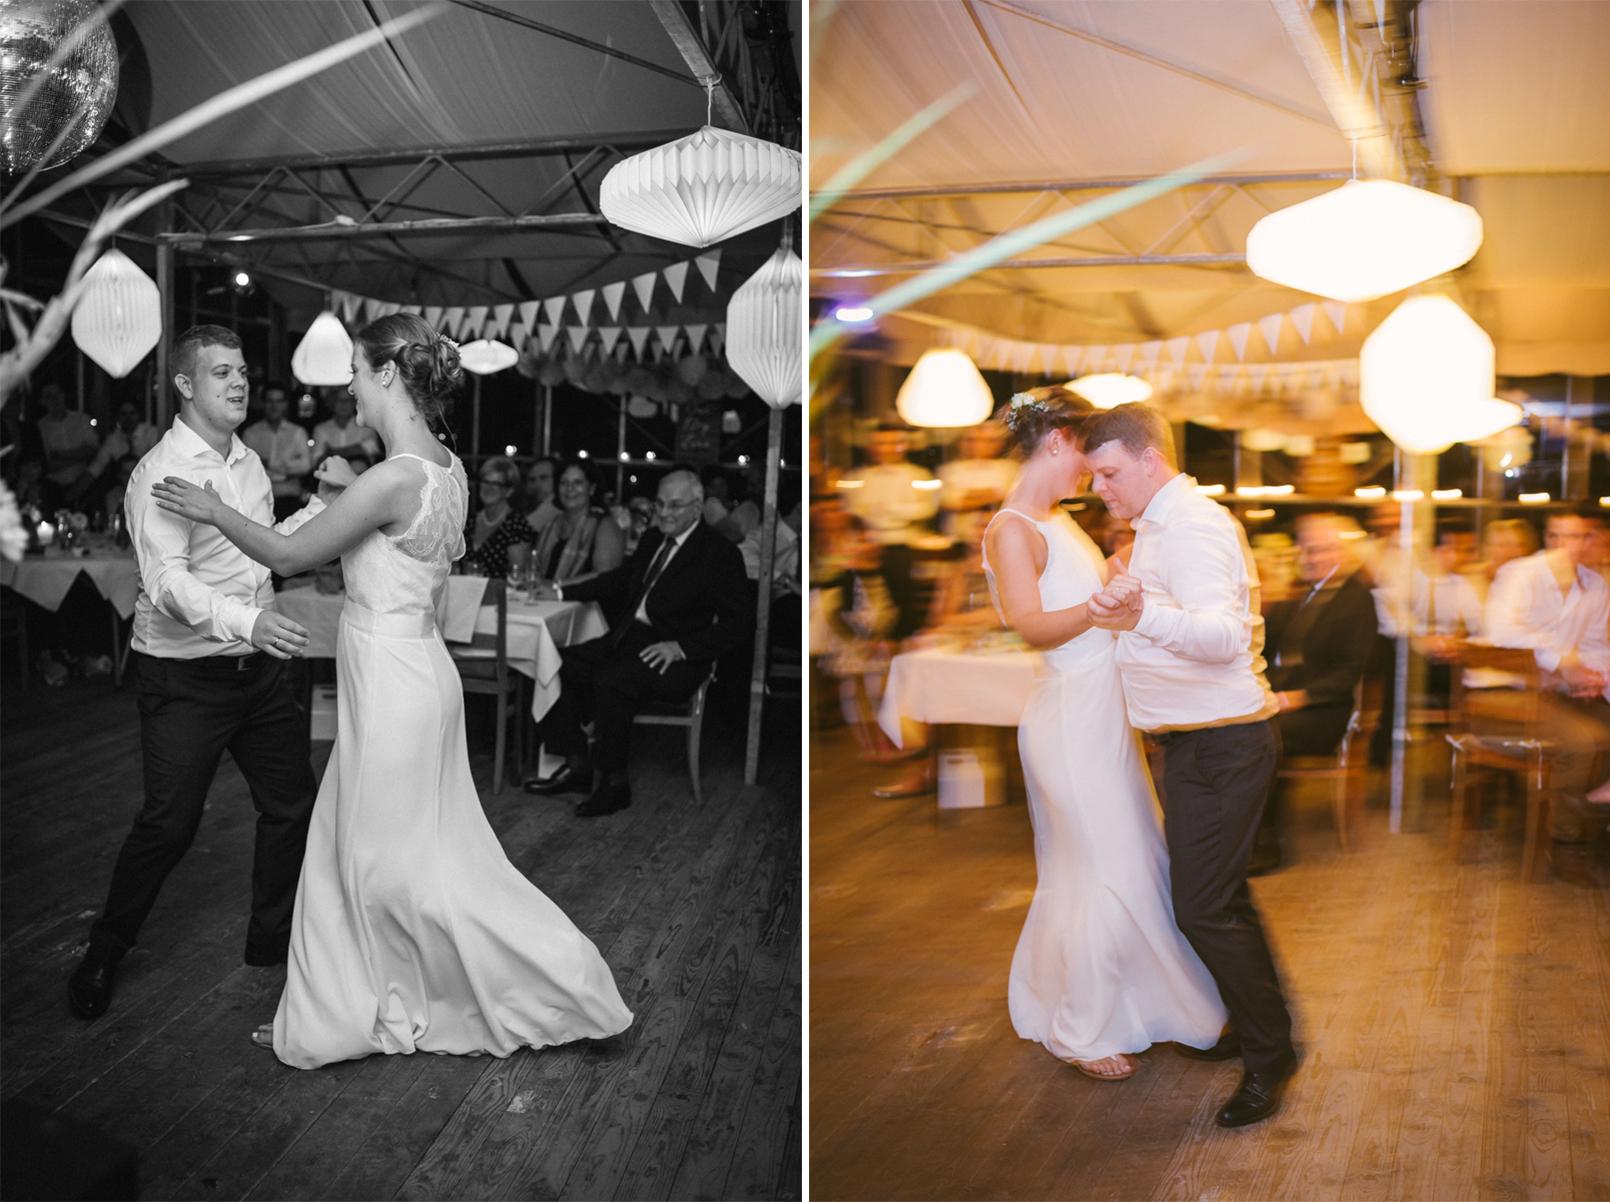 Hochzeitsfotograf-Fotografie-Aachen-Lua-Pauline-Dreamcatcher-0084